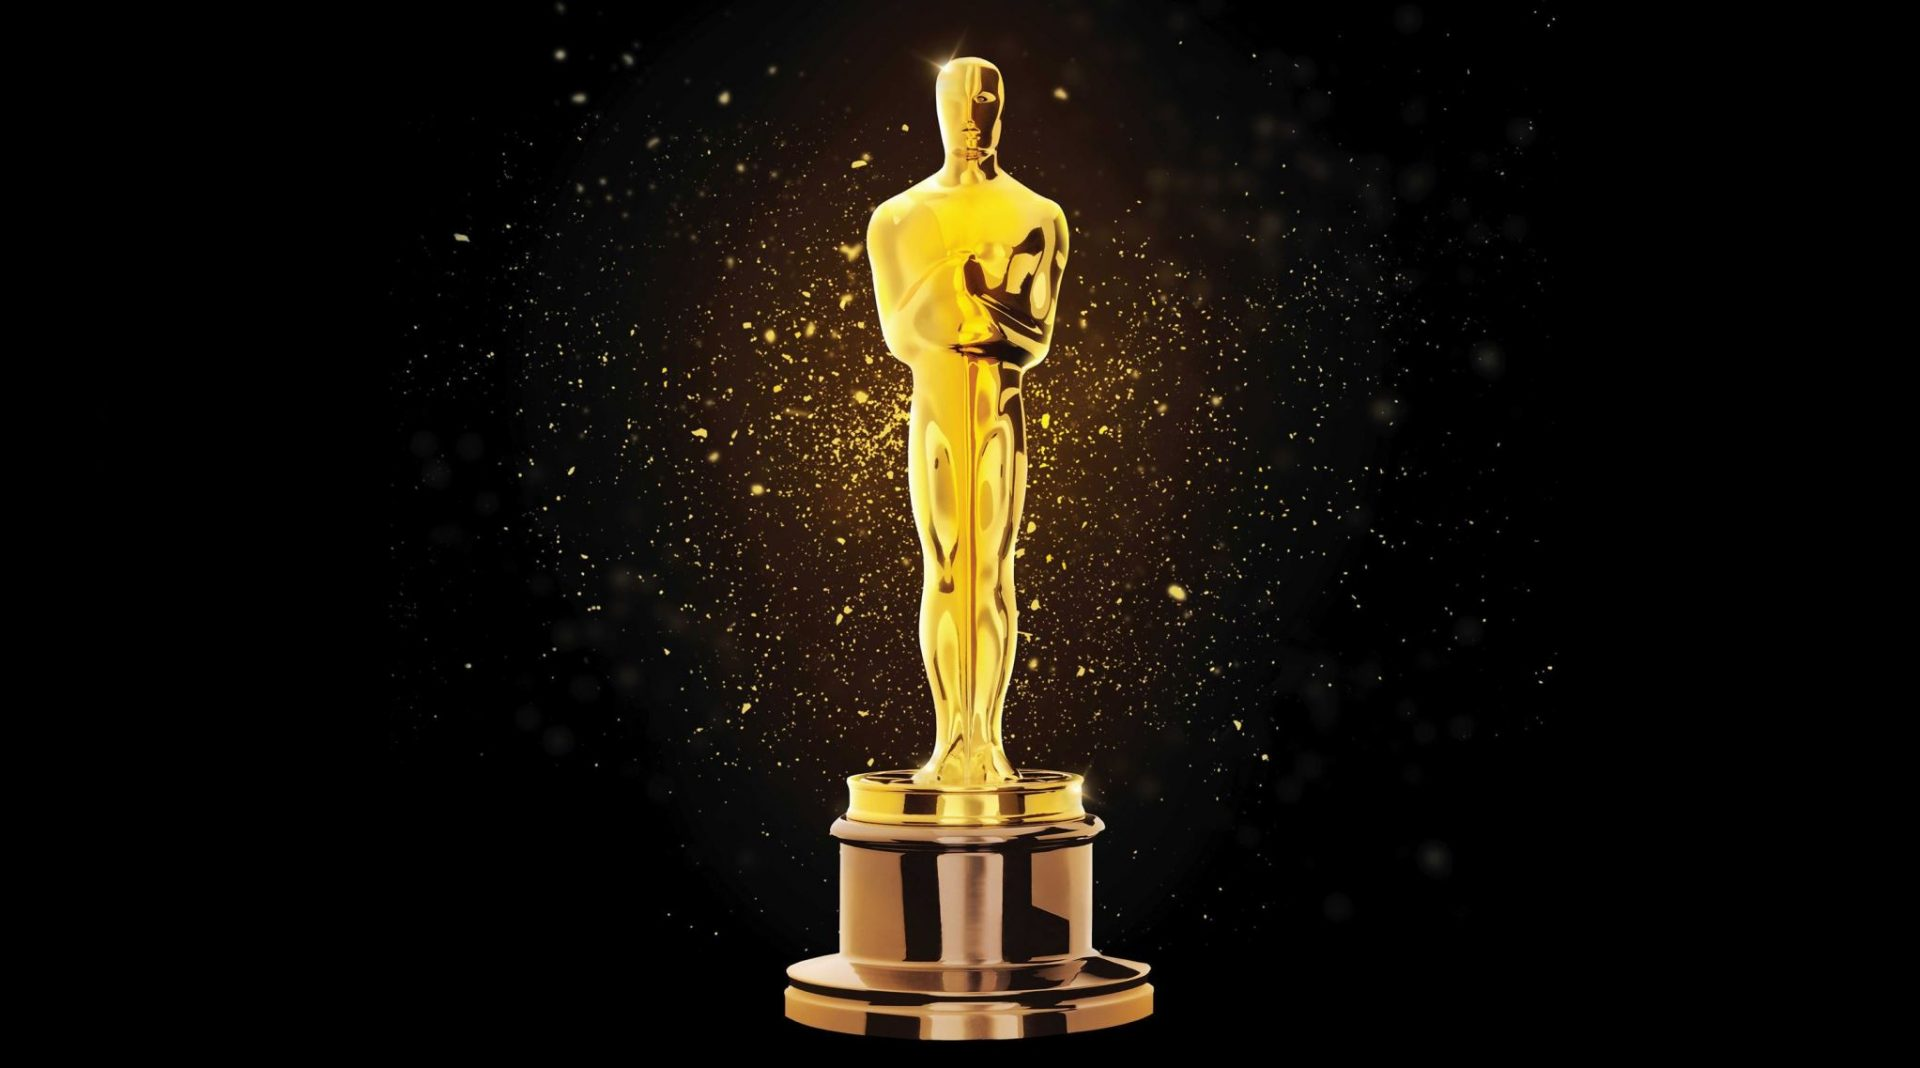 film vincitori degli oscar 2021